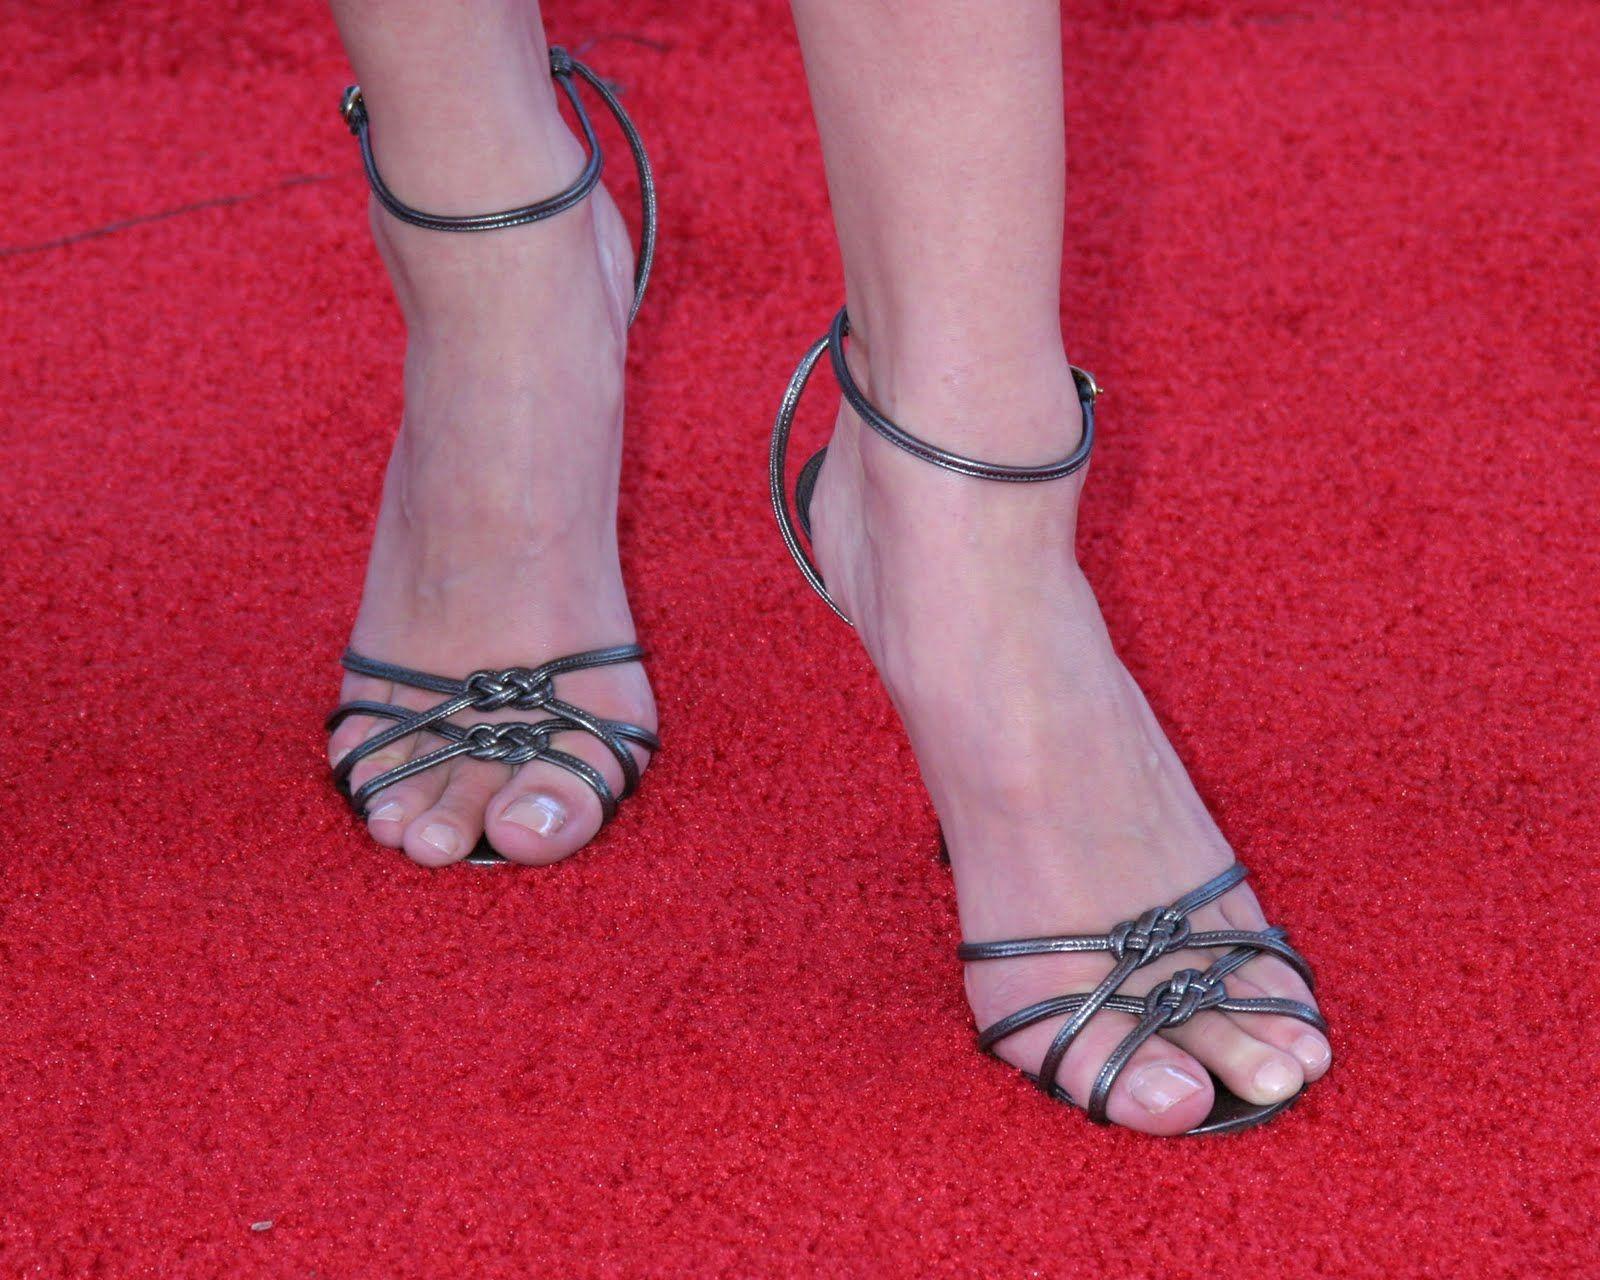 Feet Hilary Swank nudes (95 foto and video), Tits, Paparazzi, Boobs, bra 2017